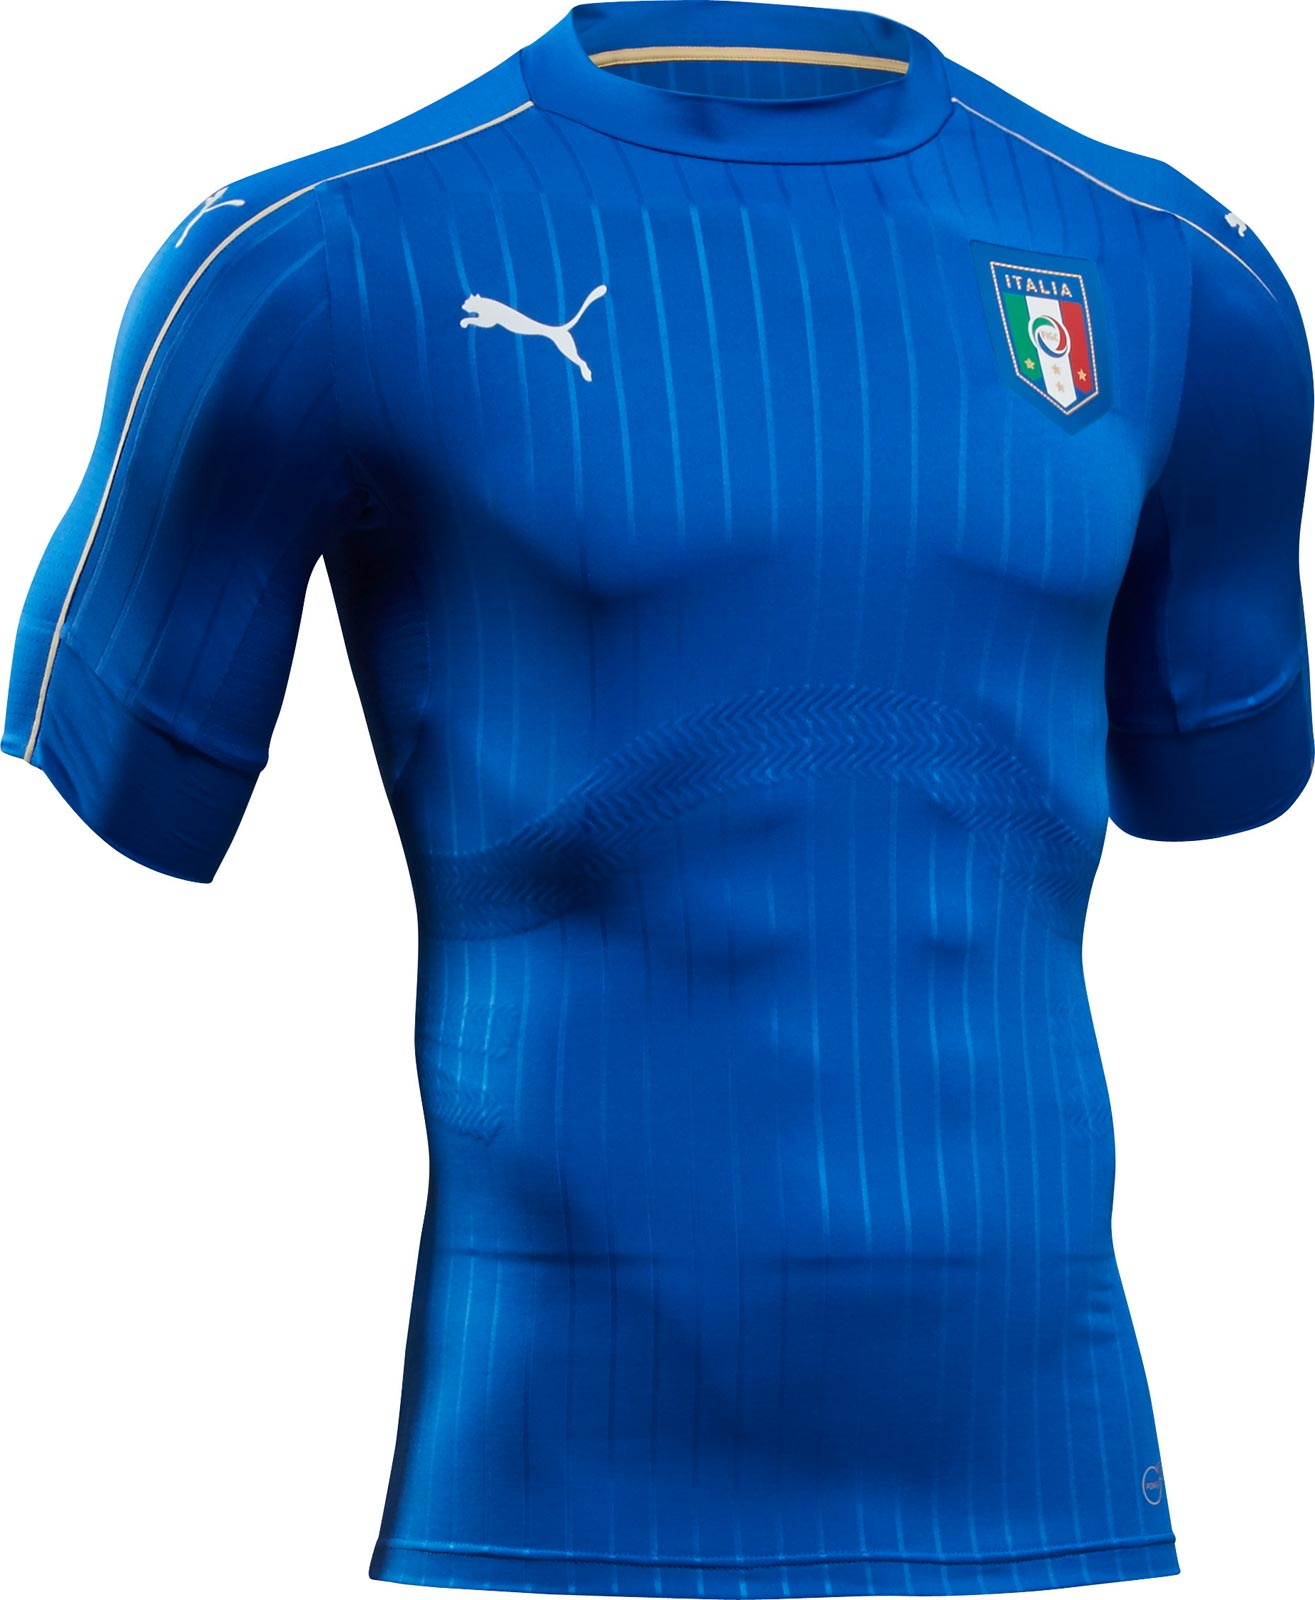 jersey italia home euro 2016